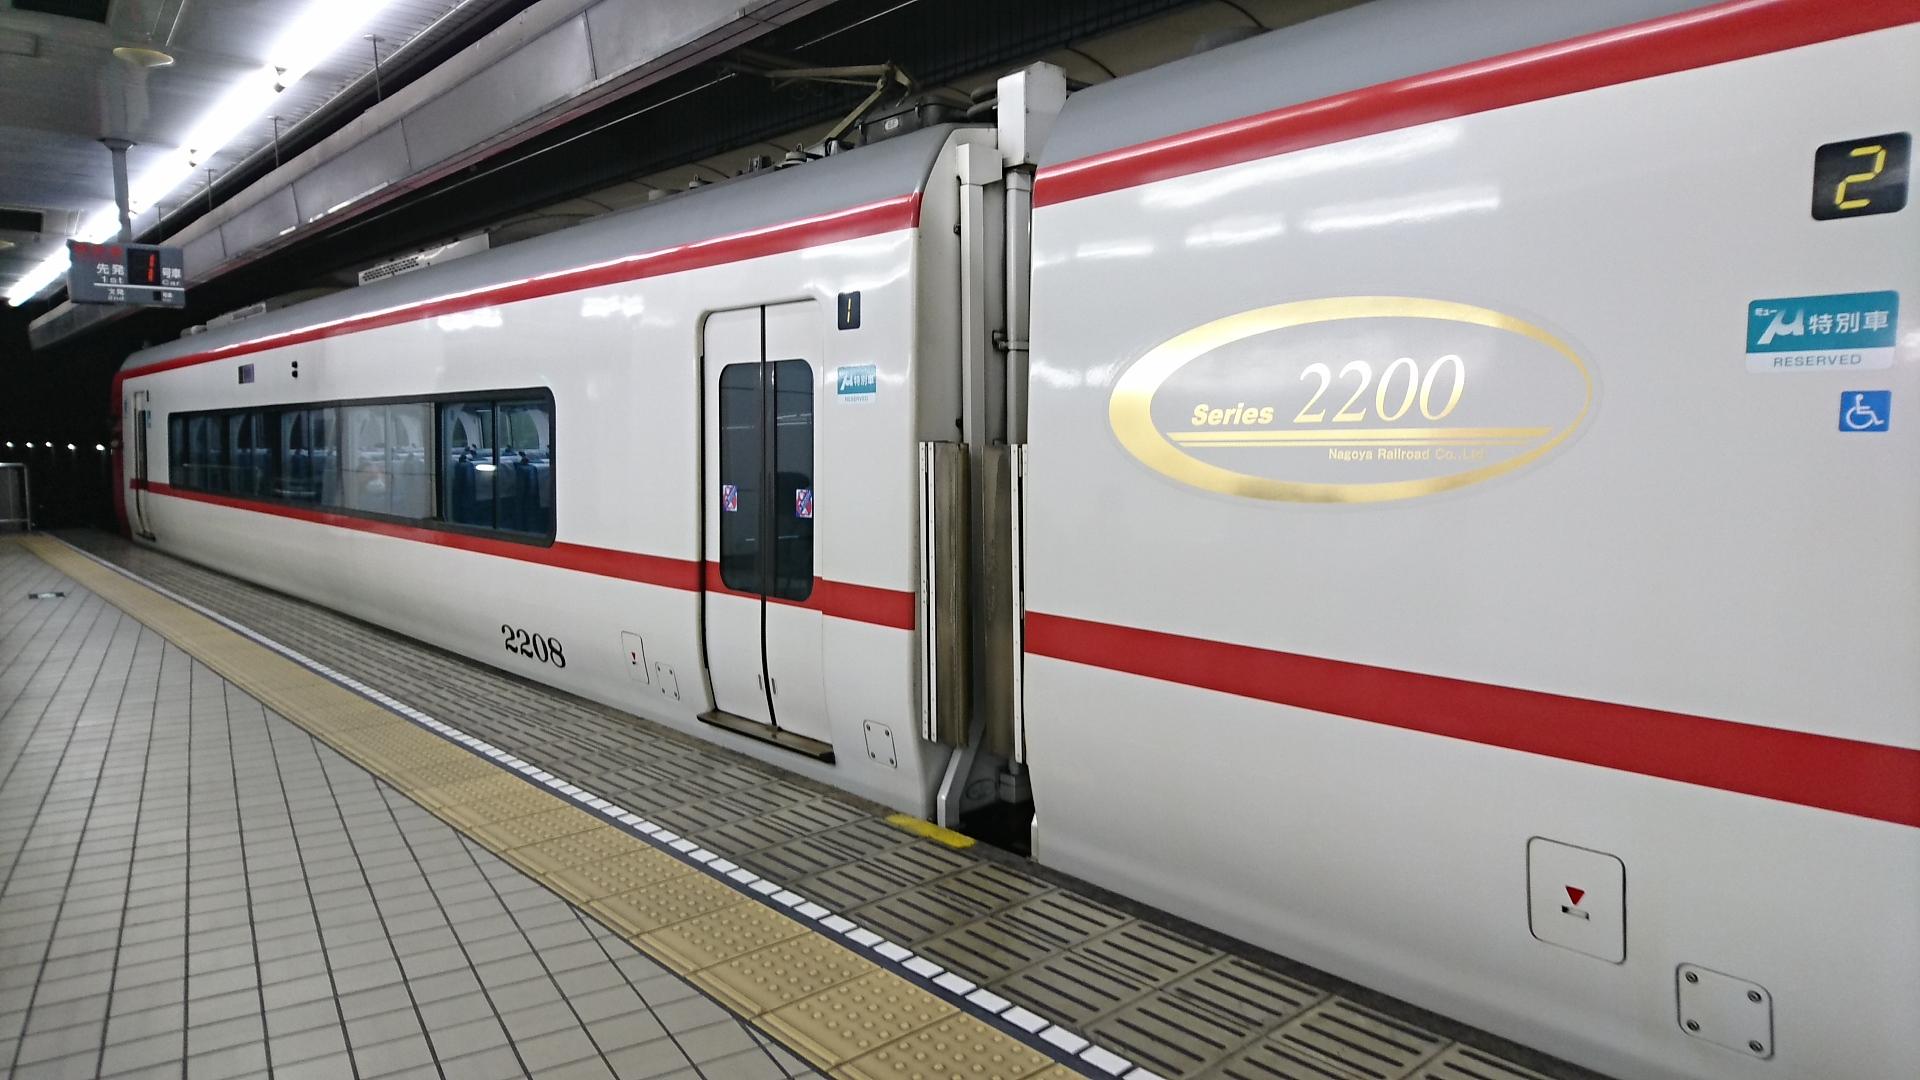 2017.12.19 名古屋 (5) 名古屋 - 岐阜いき特急